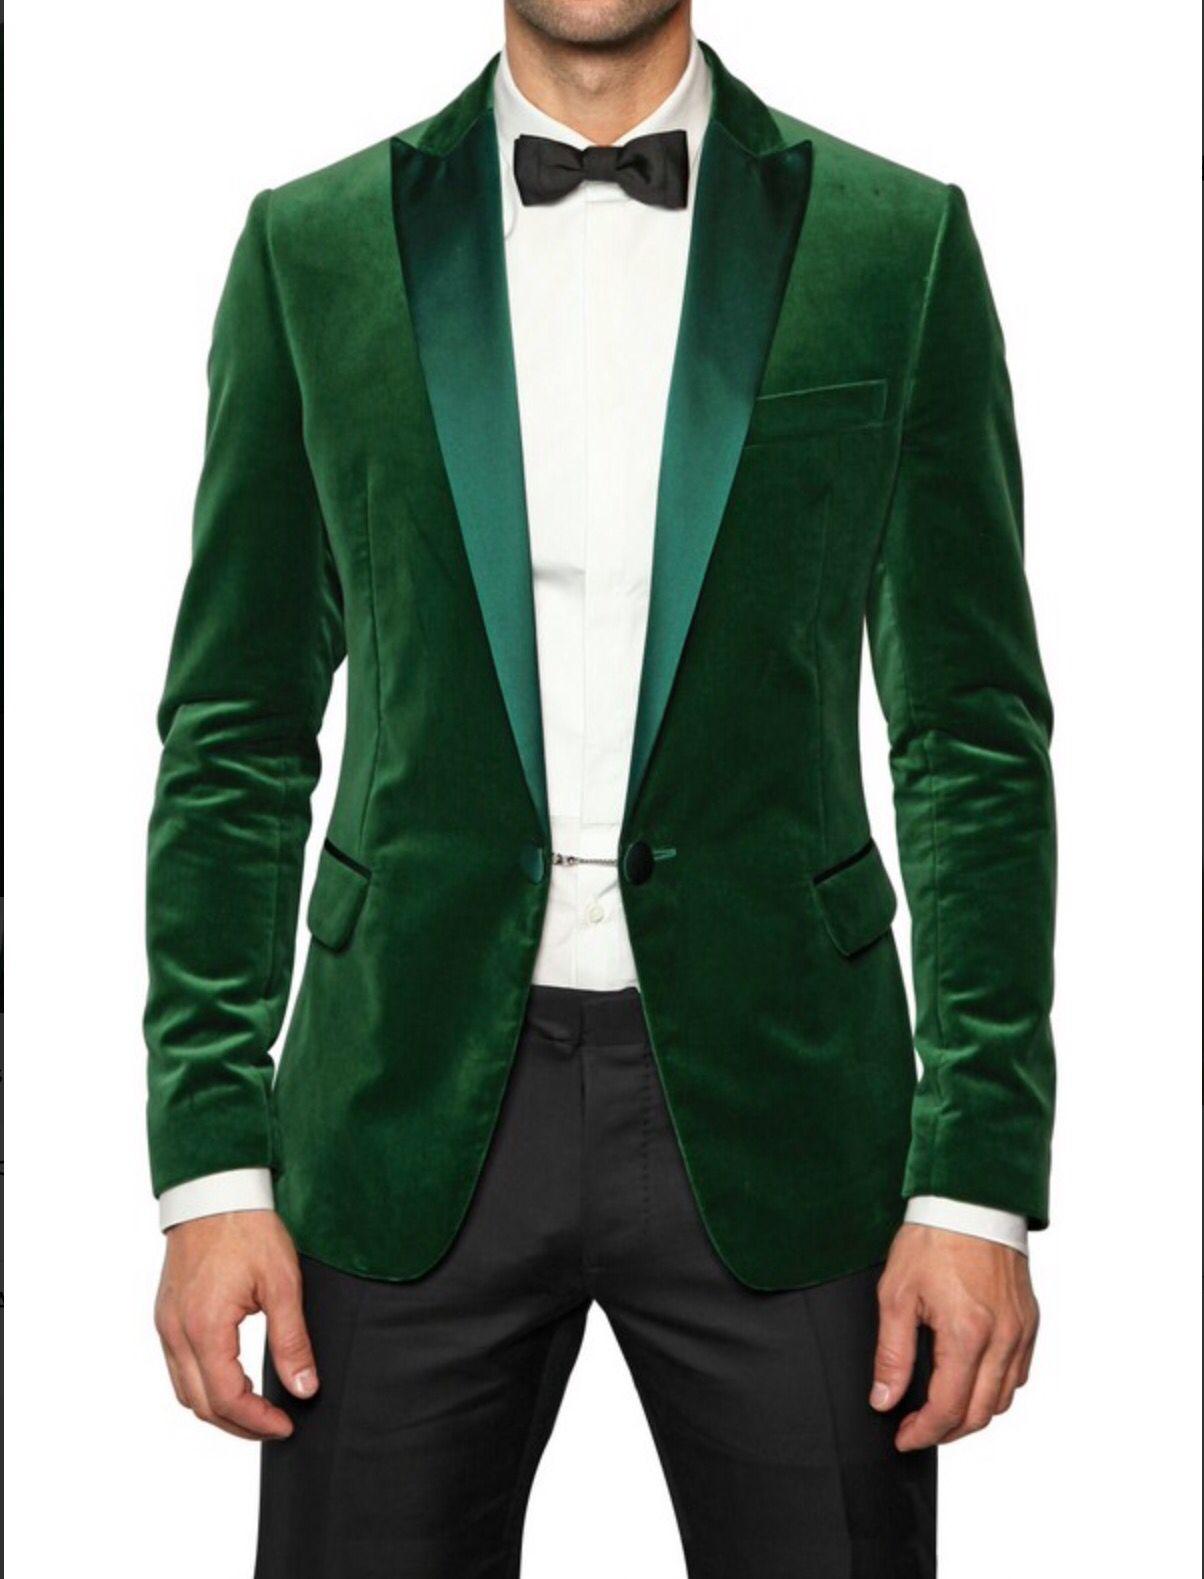 Suede green jacket for weeding Green velvet blazer